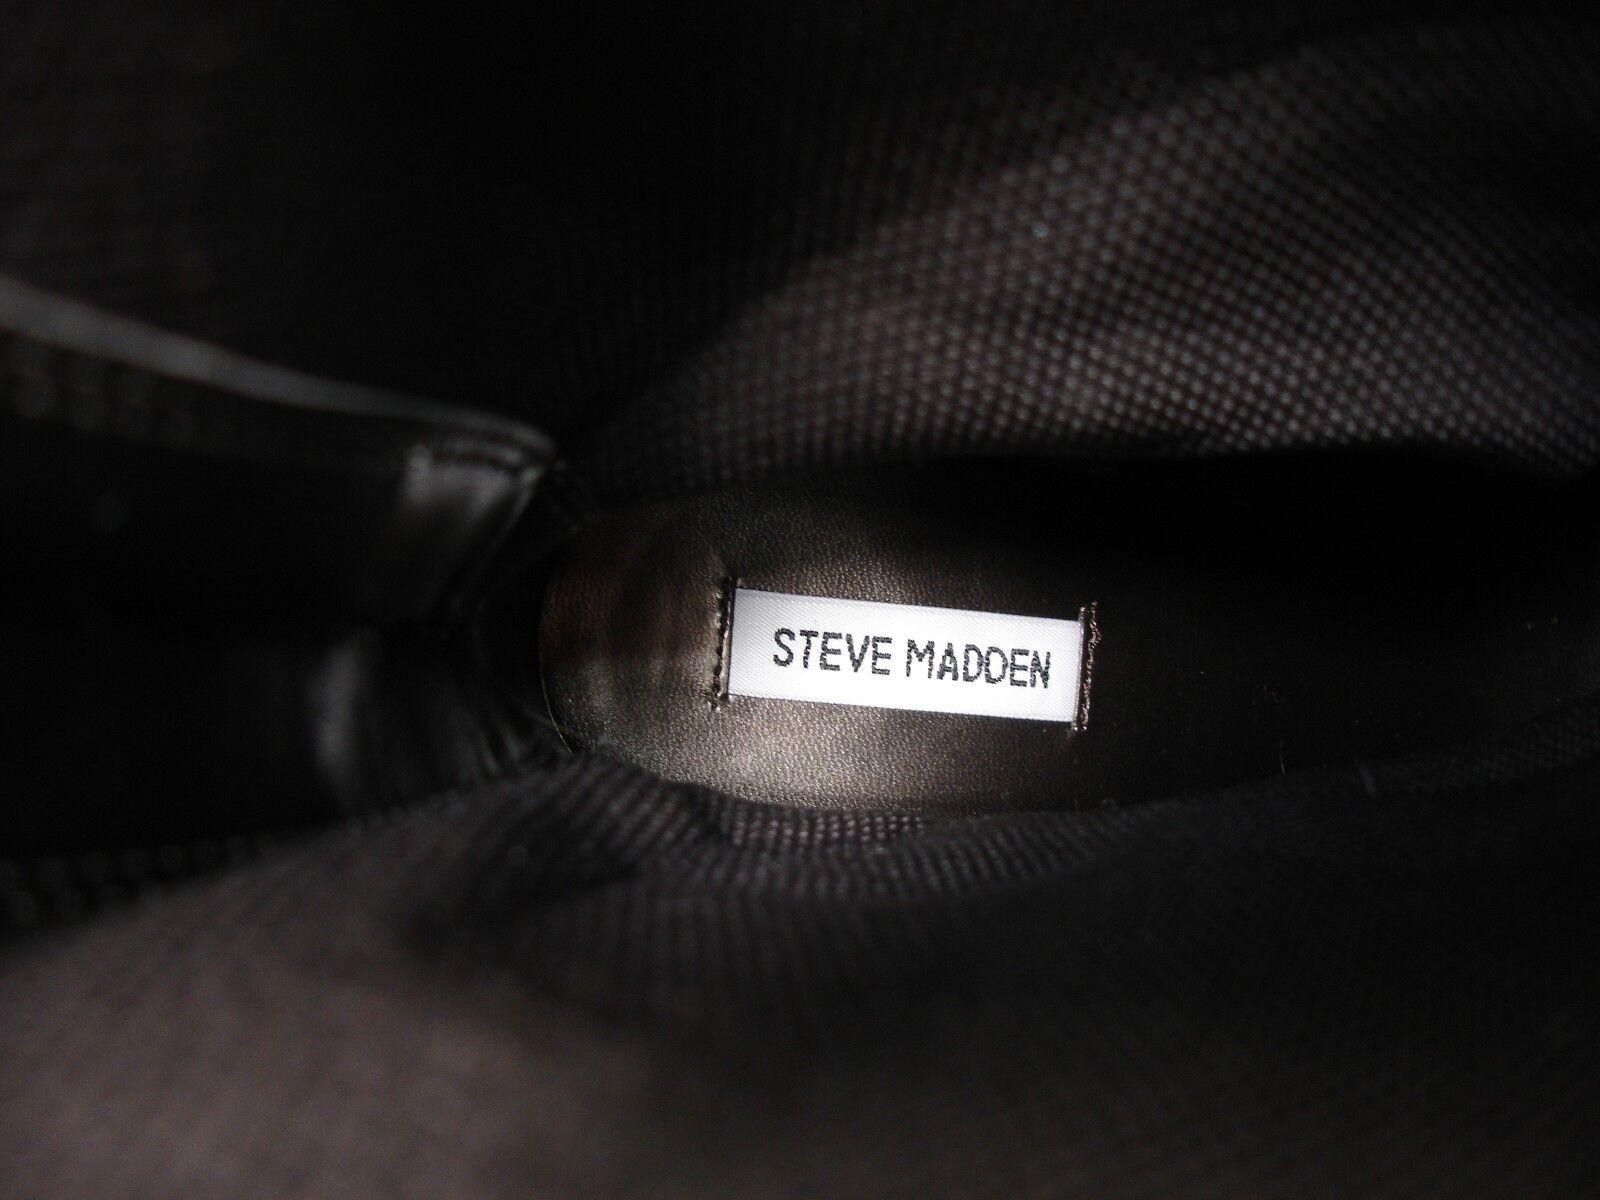 STEVE MADDEN HARTHROB 2 TONE LEATHER PULL ON BELOW BELOW BELOW CALF BOOTS WOMEN'S 8 63b9c1